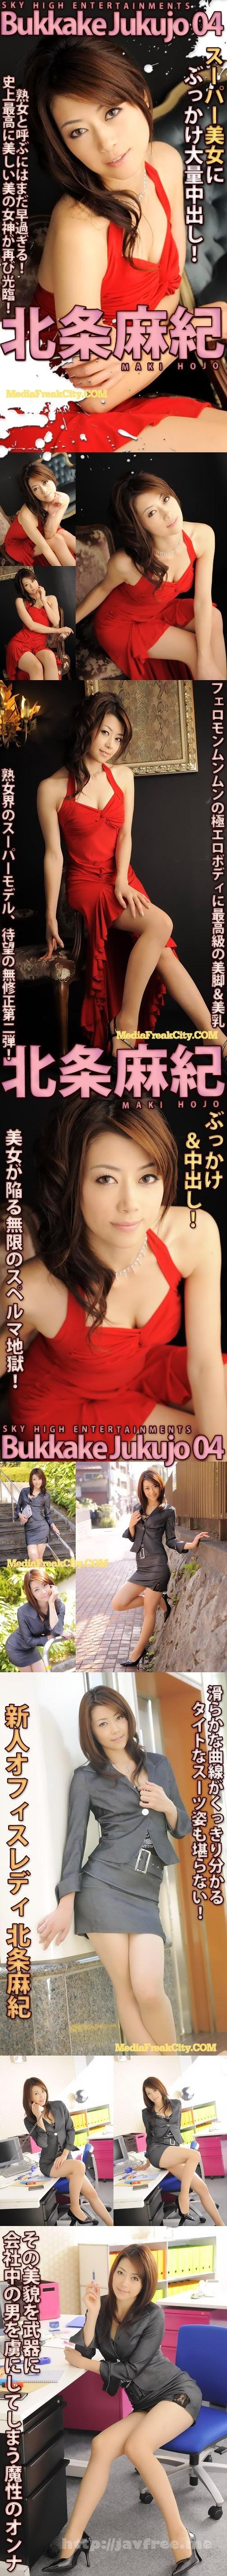 [SKY-151] ぶっかけ熟女 Vol.3 : 北条麻妃